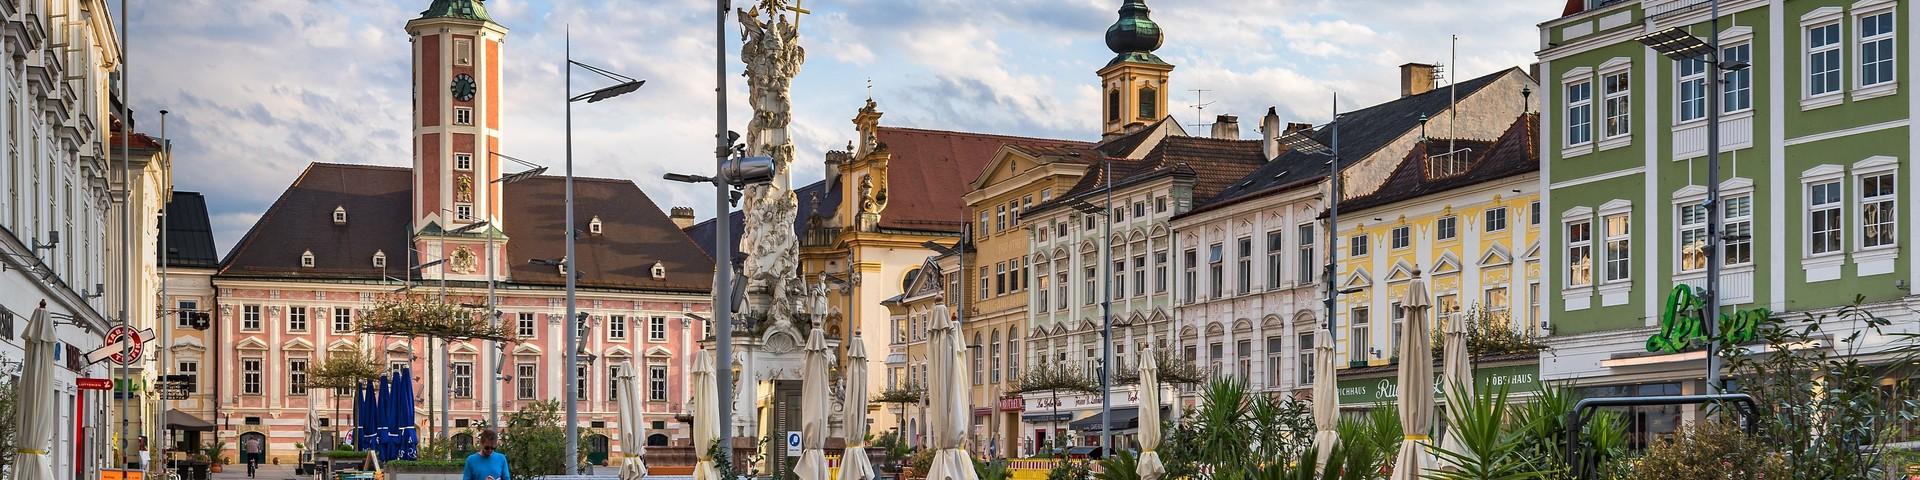 St. Pölten - Rathausplatz © SEPAMedia